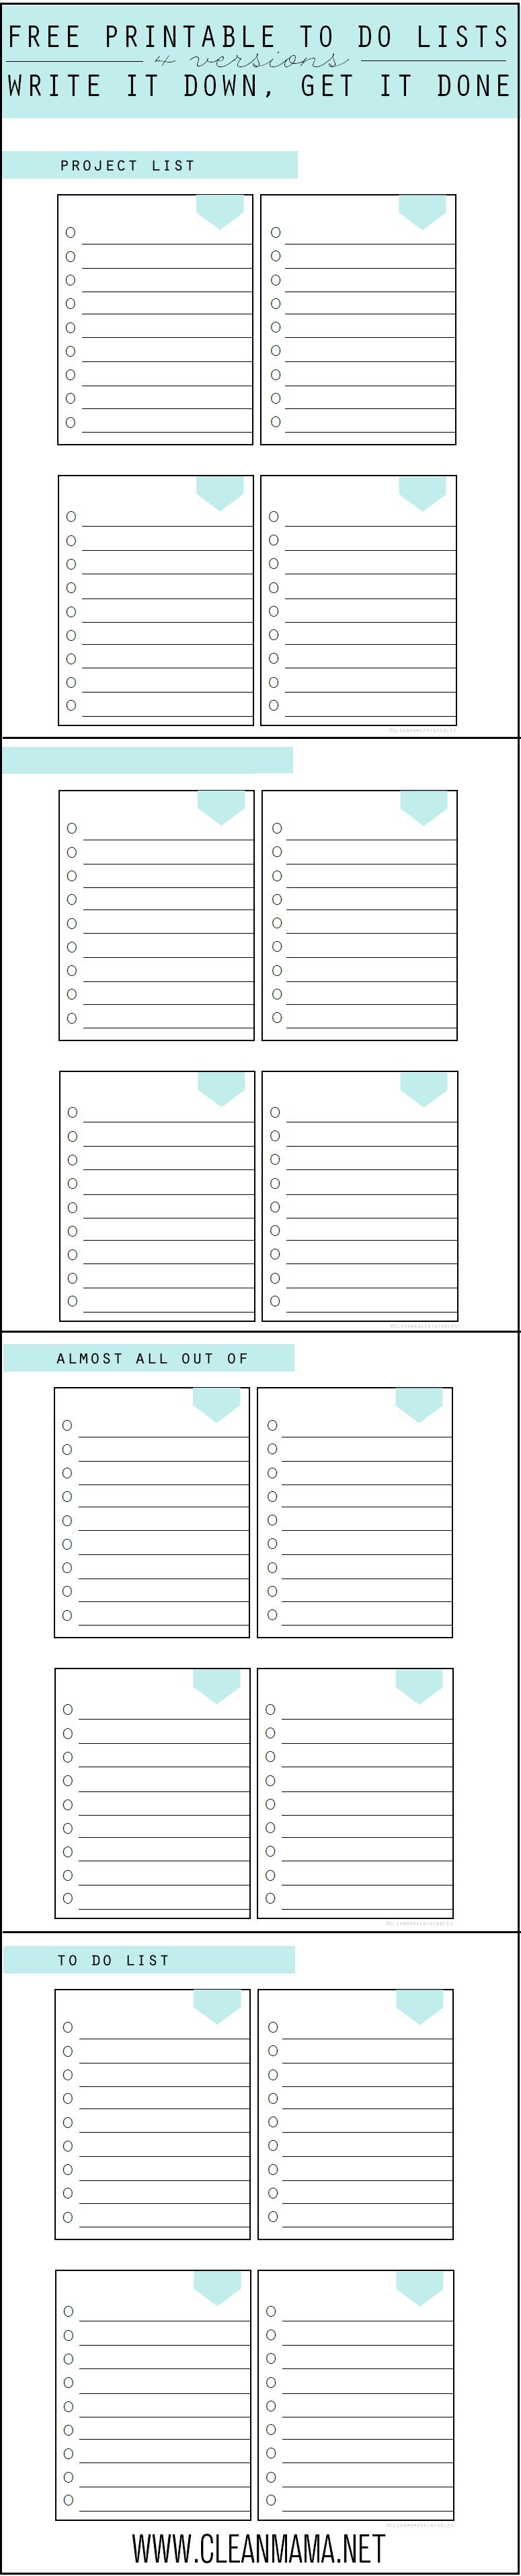 4 FREE Printable To Do Lists via Clean Mama